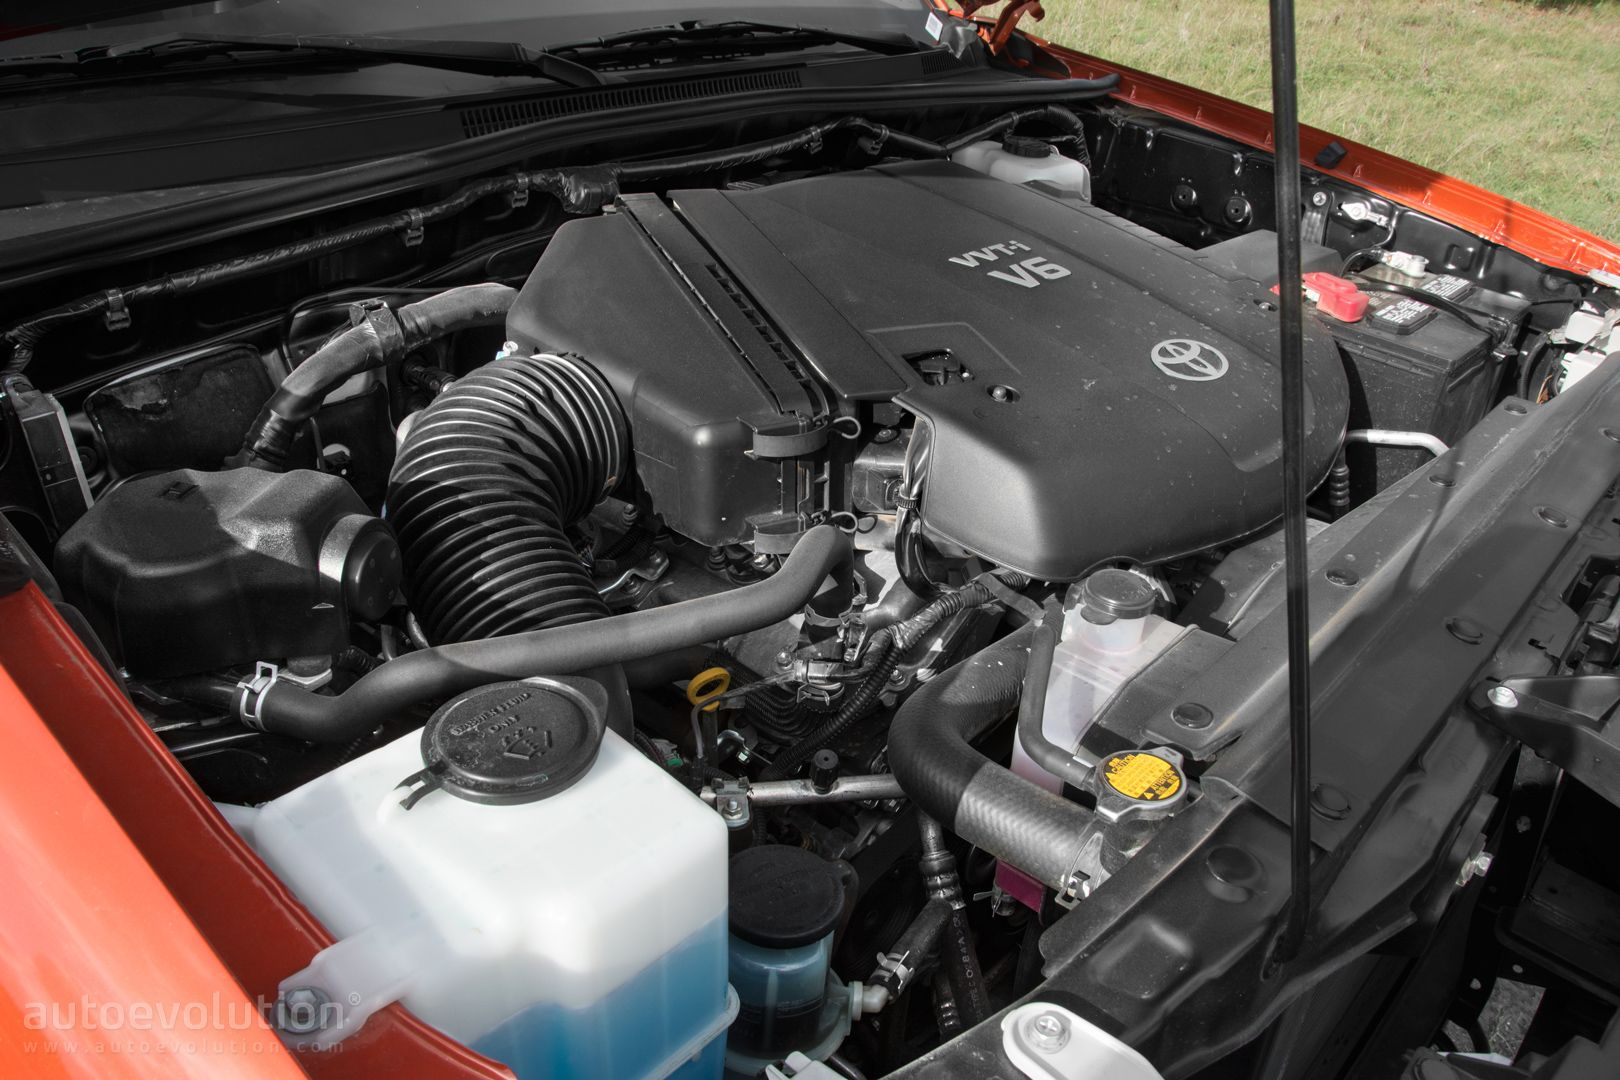 2015 Toyota Tacoma Trd Pro Review Autoevolution